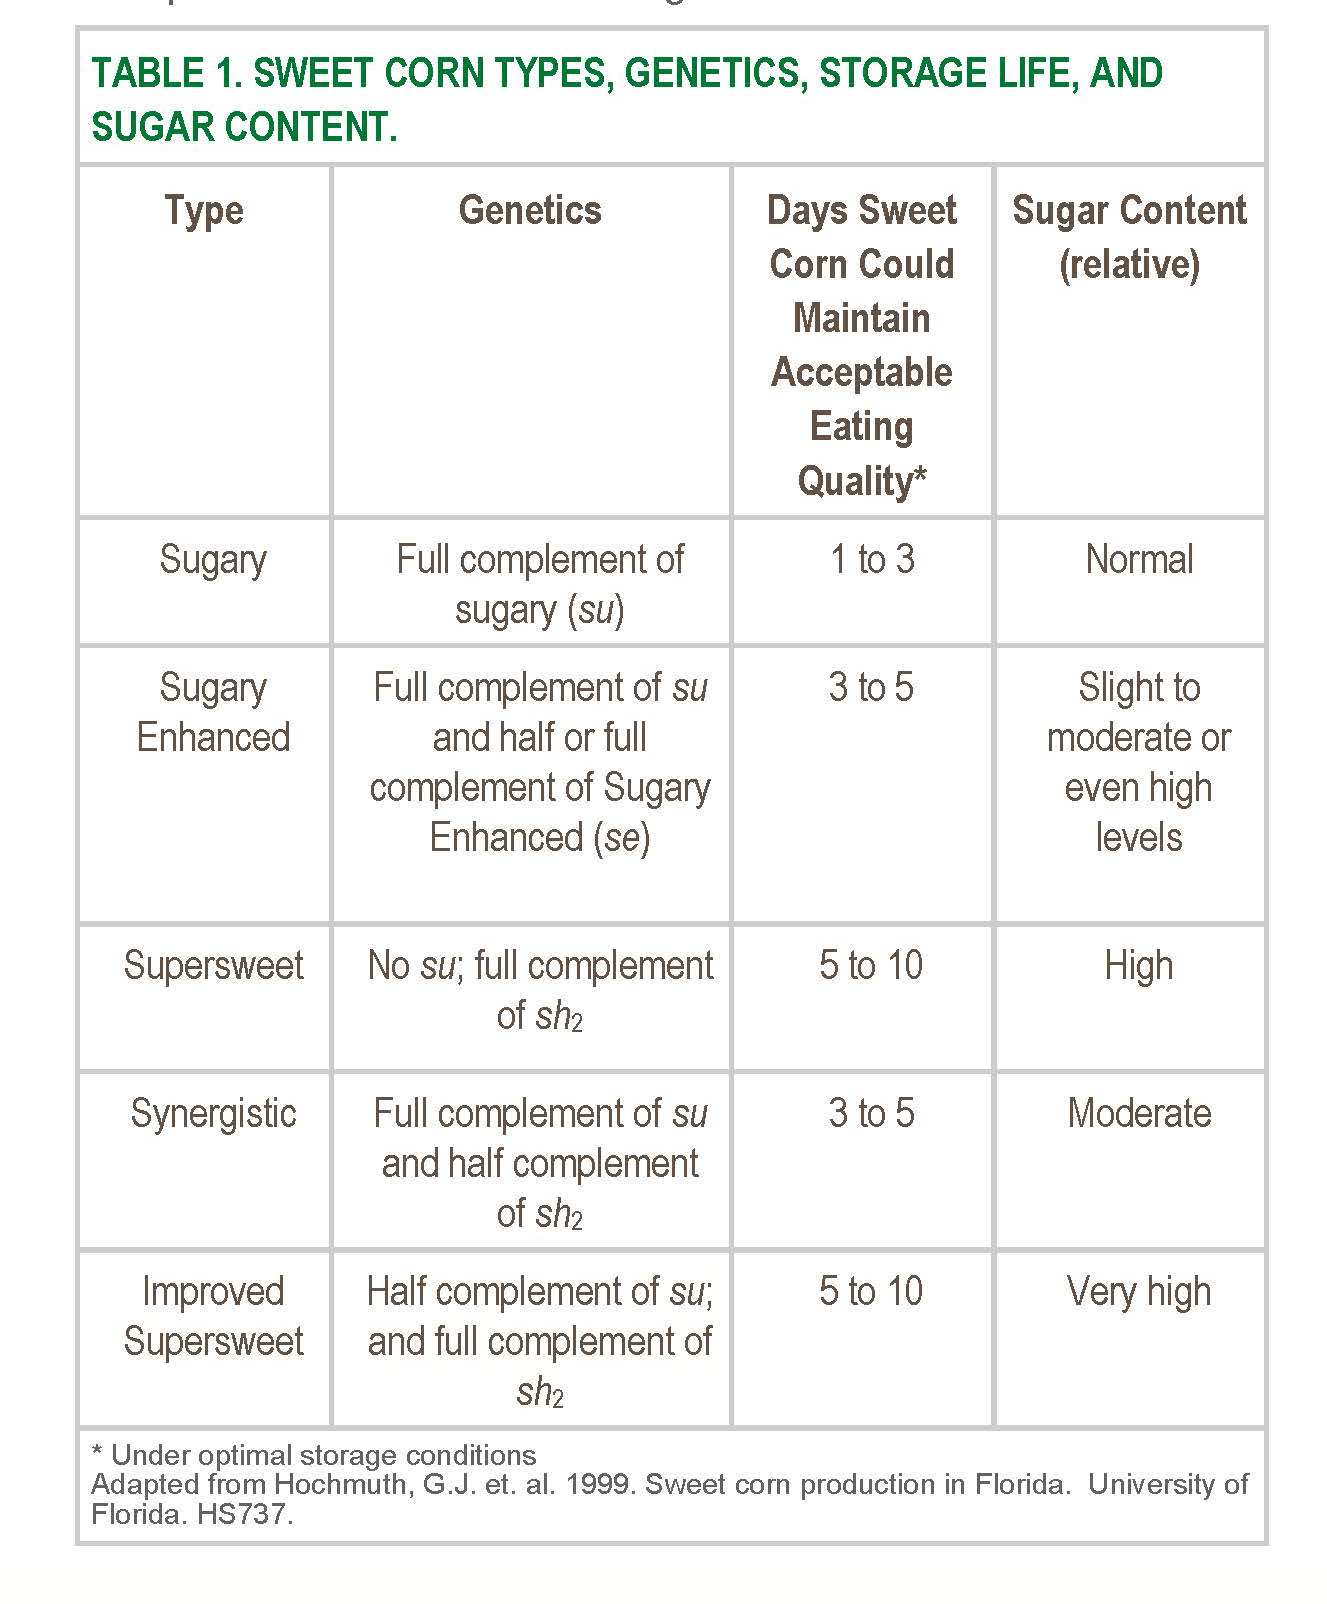 Sweet Corn Genetics And Isolation